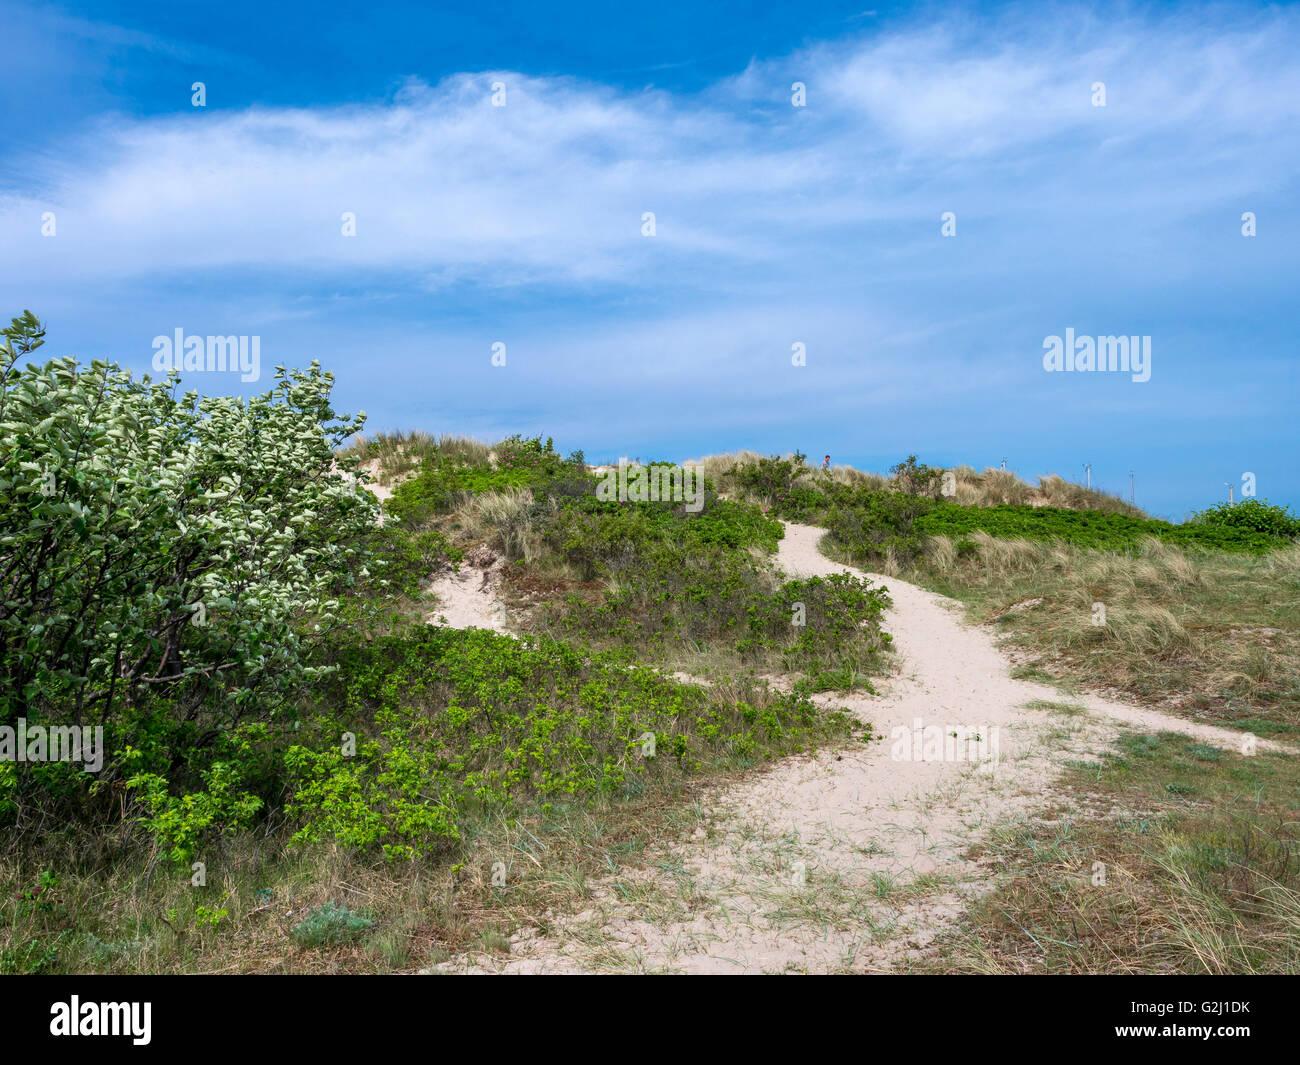 Sand dunes in the popular resort Hornbæk in North Zealand, Denmark, Scandinavia, Europe - Stock Image